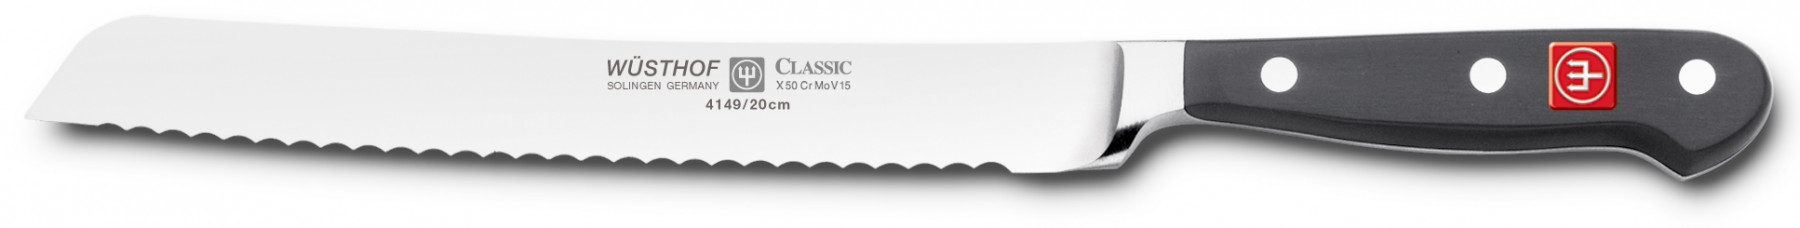 Wüsthof Dreizack Classic Messerblock 8tlg. natur Brotmesser